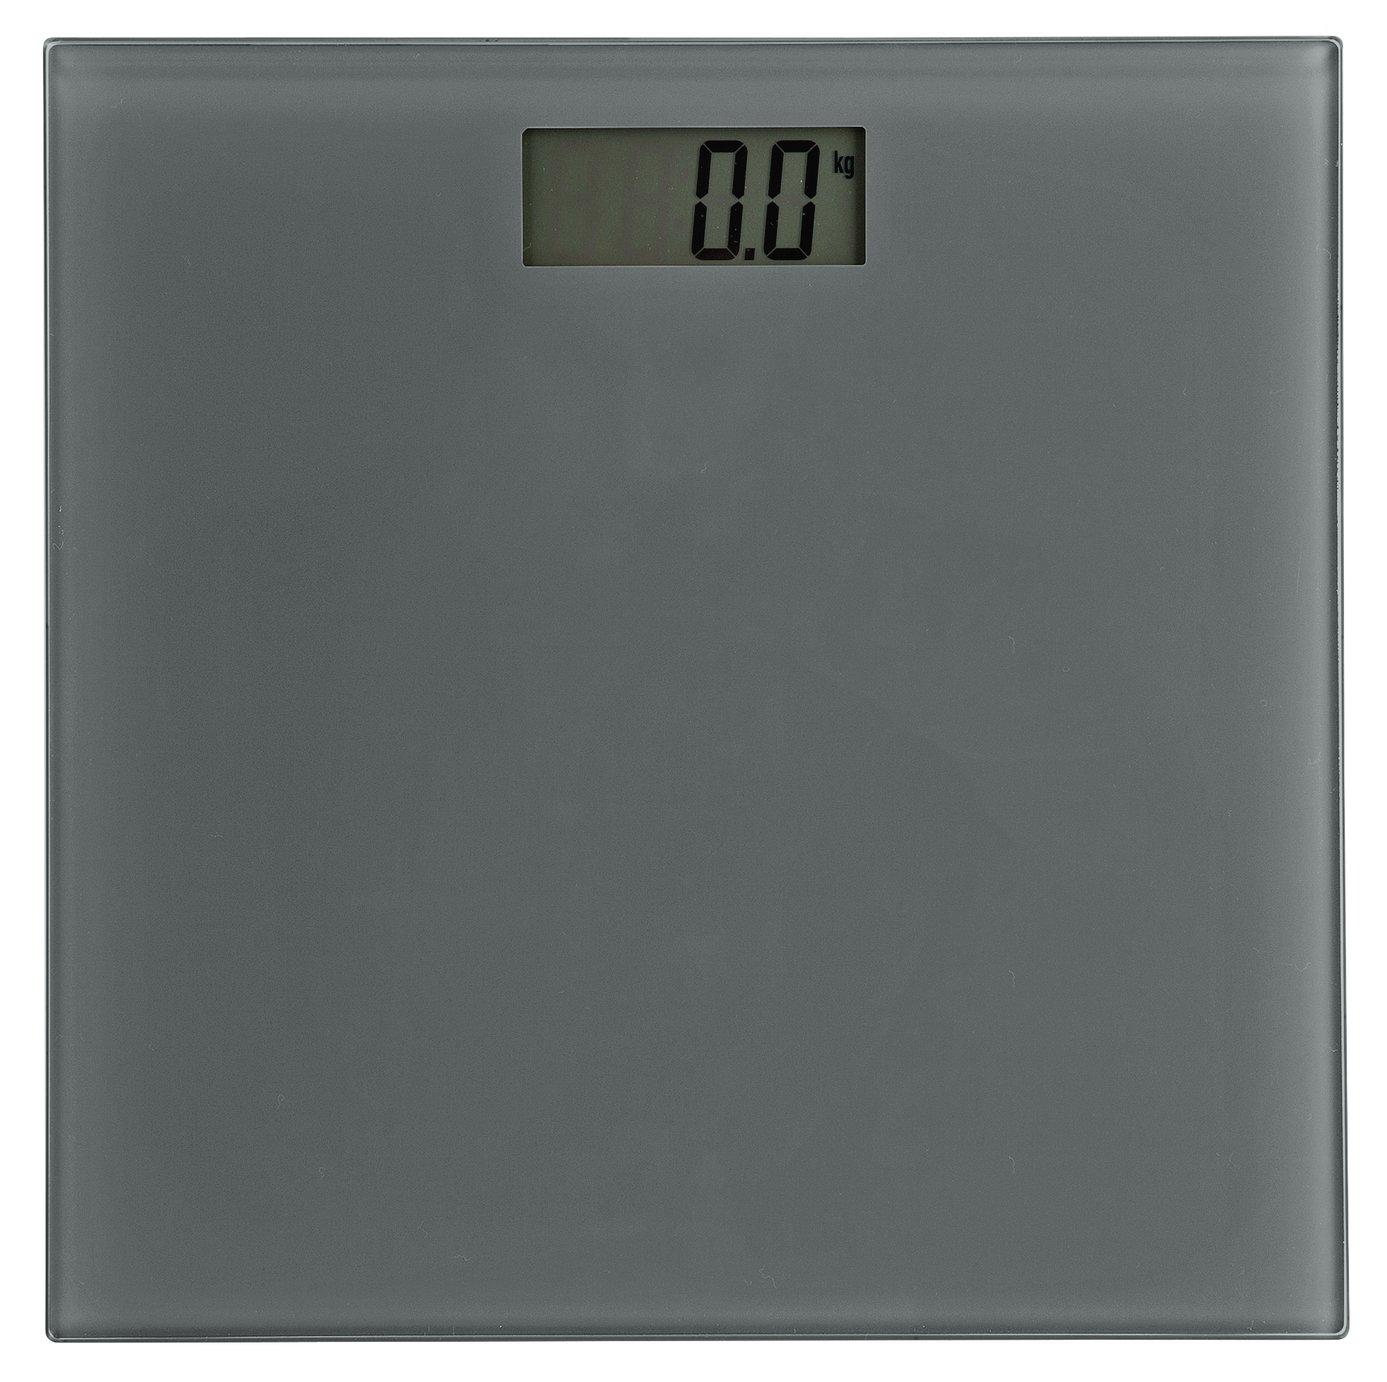 Argos Home Electronic Bathroom Scales - Grey